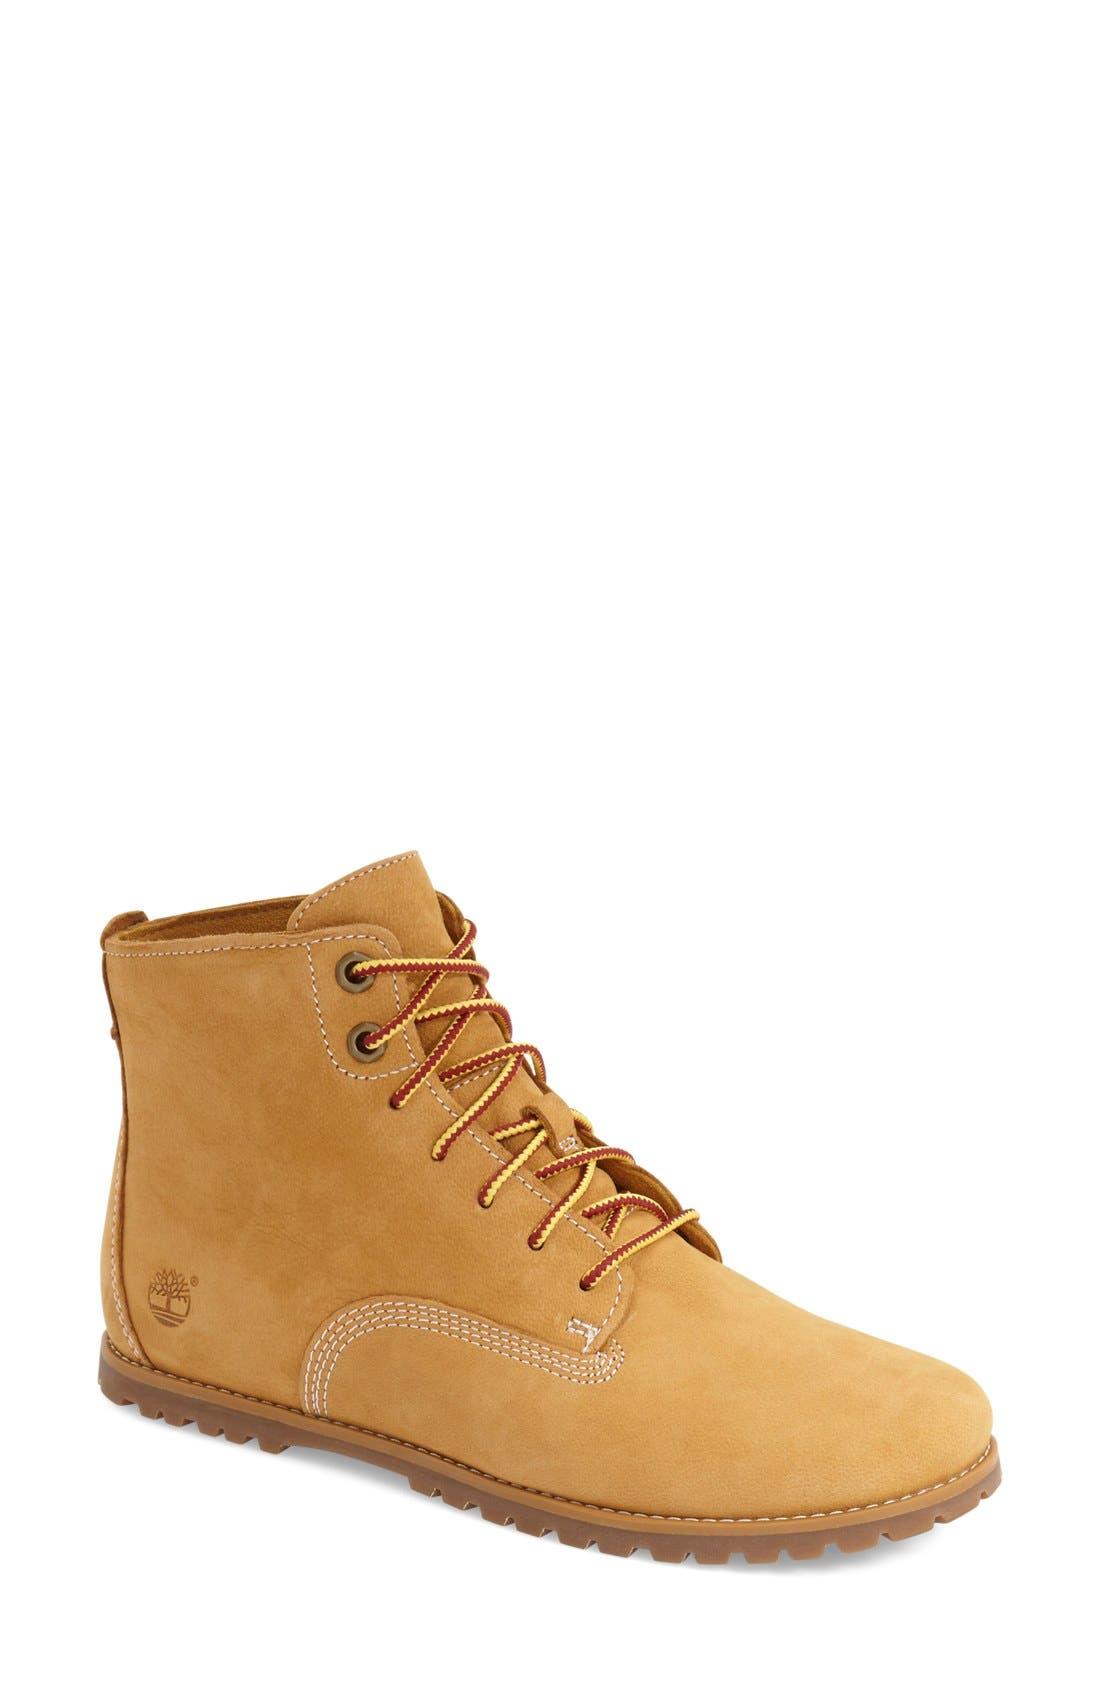 timberland joslin chukka boots (womens)